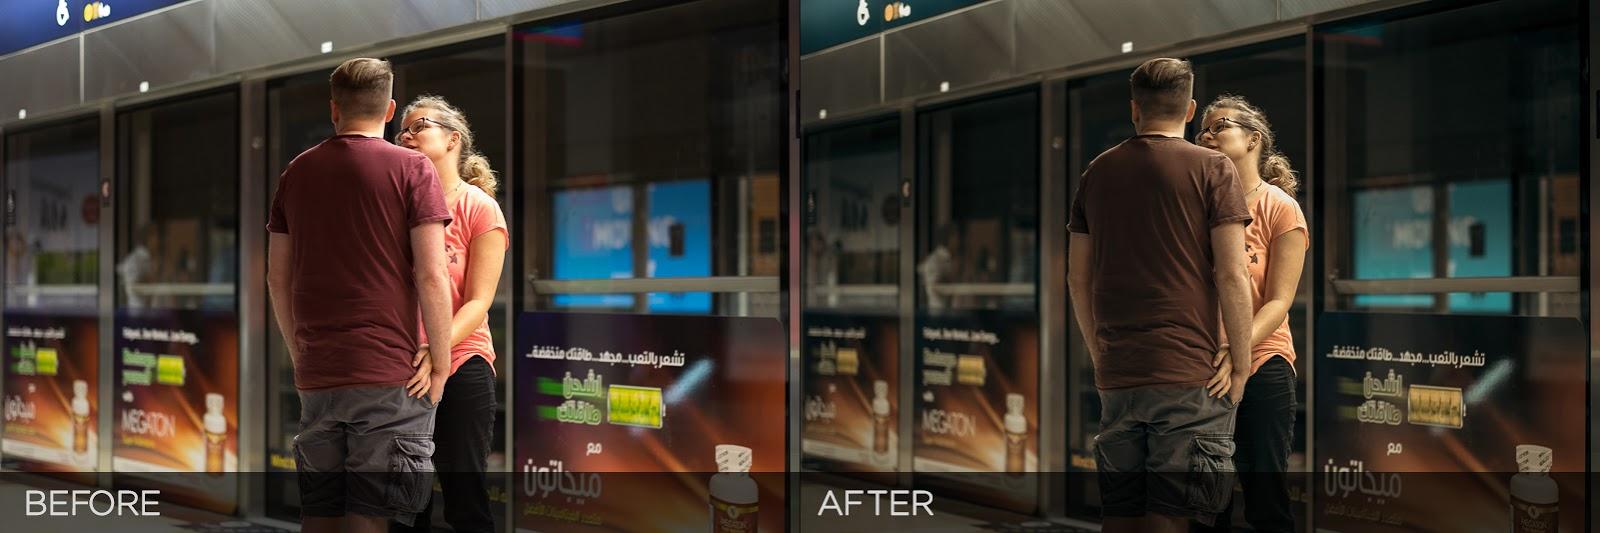 Cinema Night - Free Lightroom Preset | Rufat Abas Photography